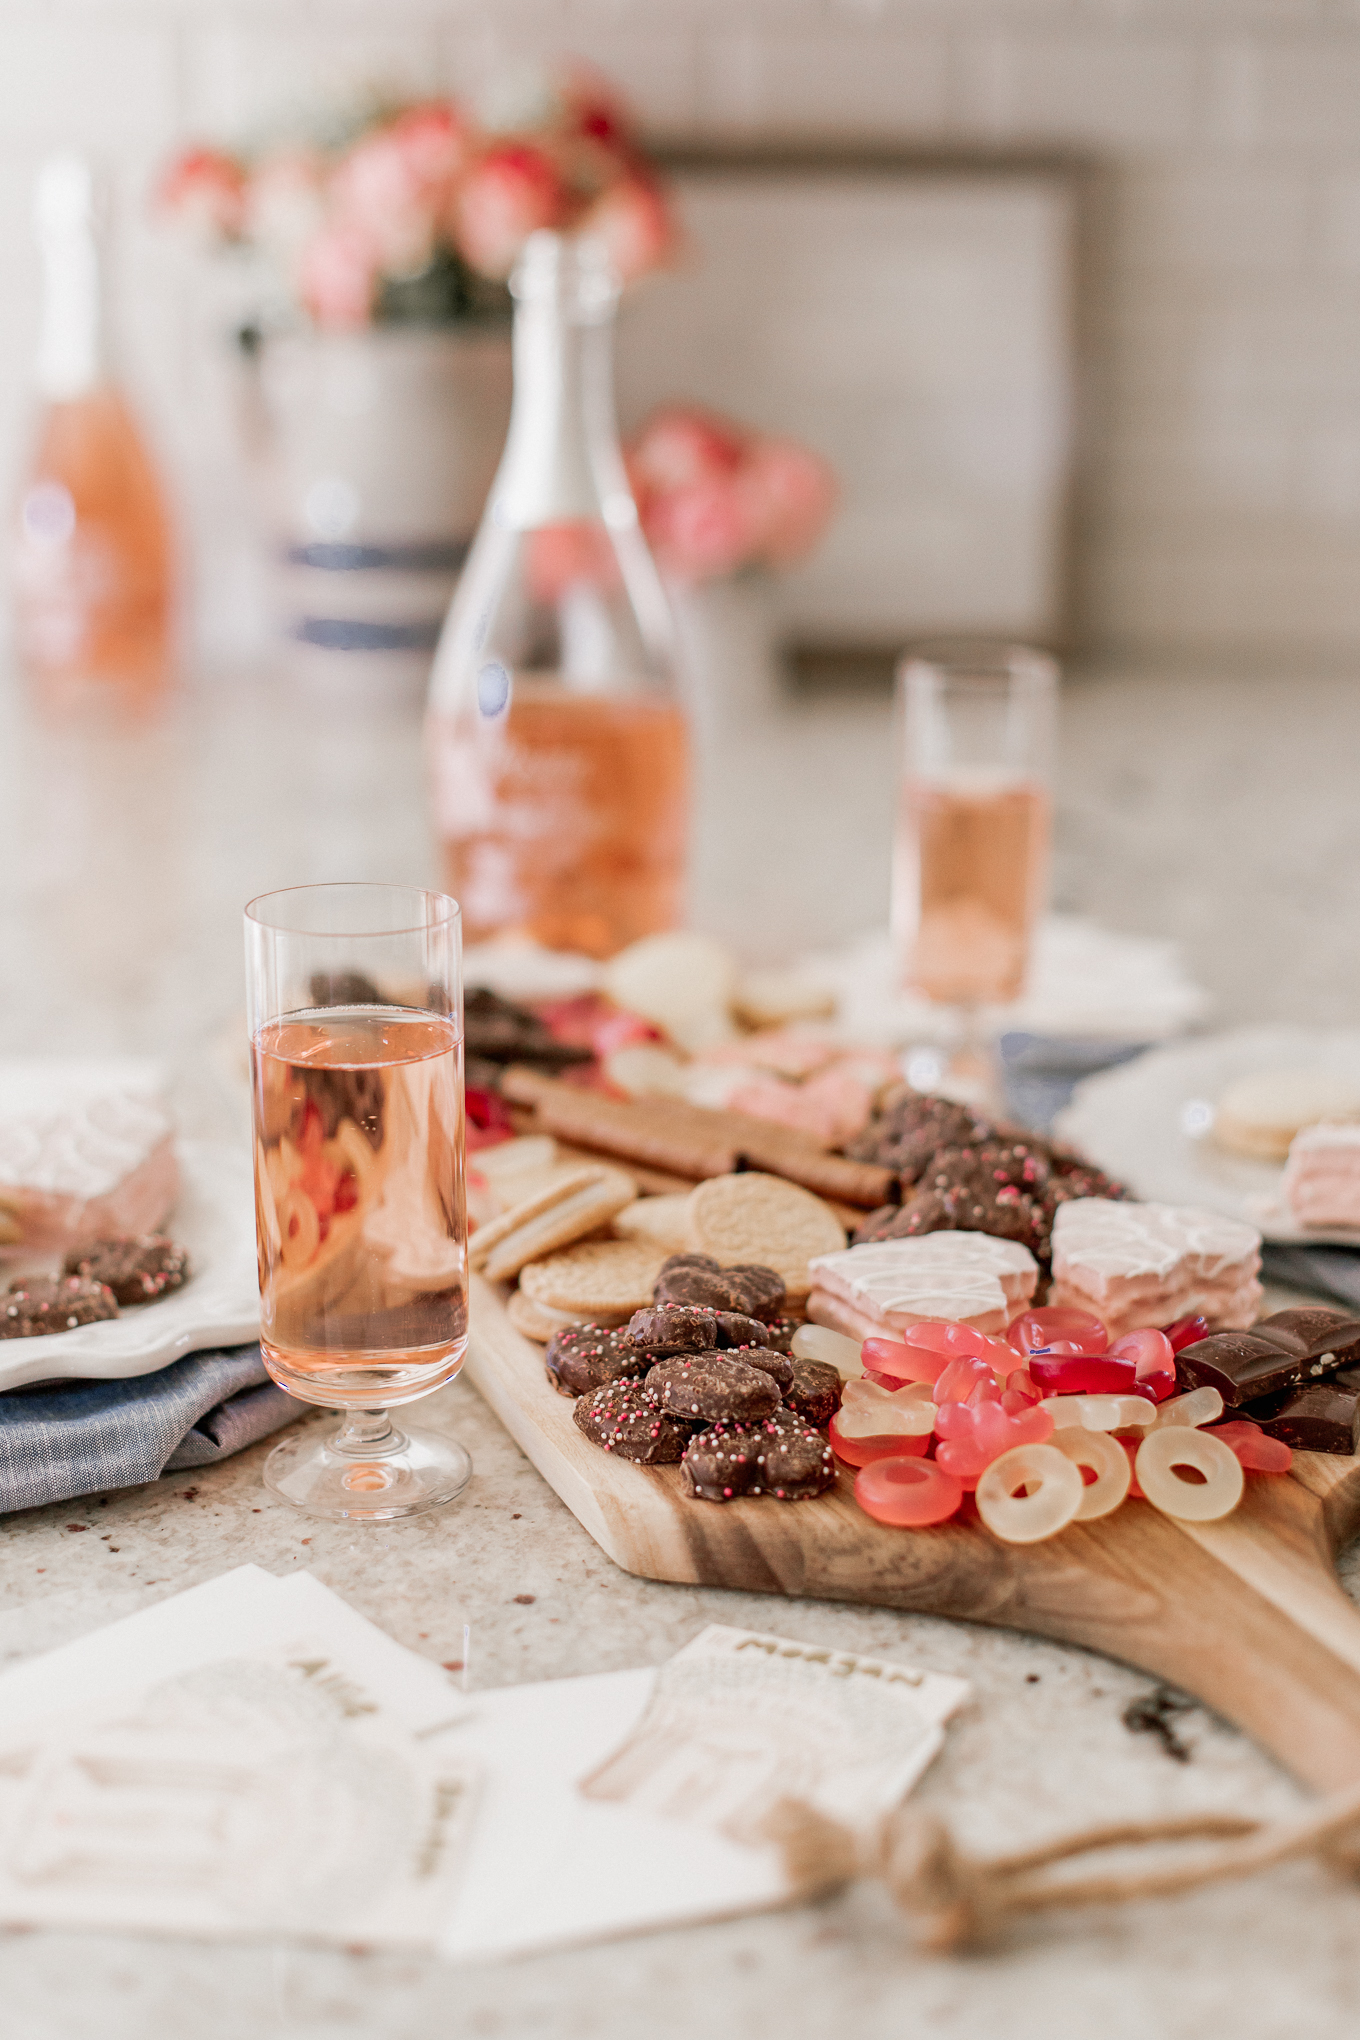 How to Make a Valentine's Day Dessert Charcuterie Board | Dessert Charcuterie Board | Louella Reese